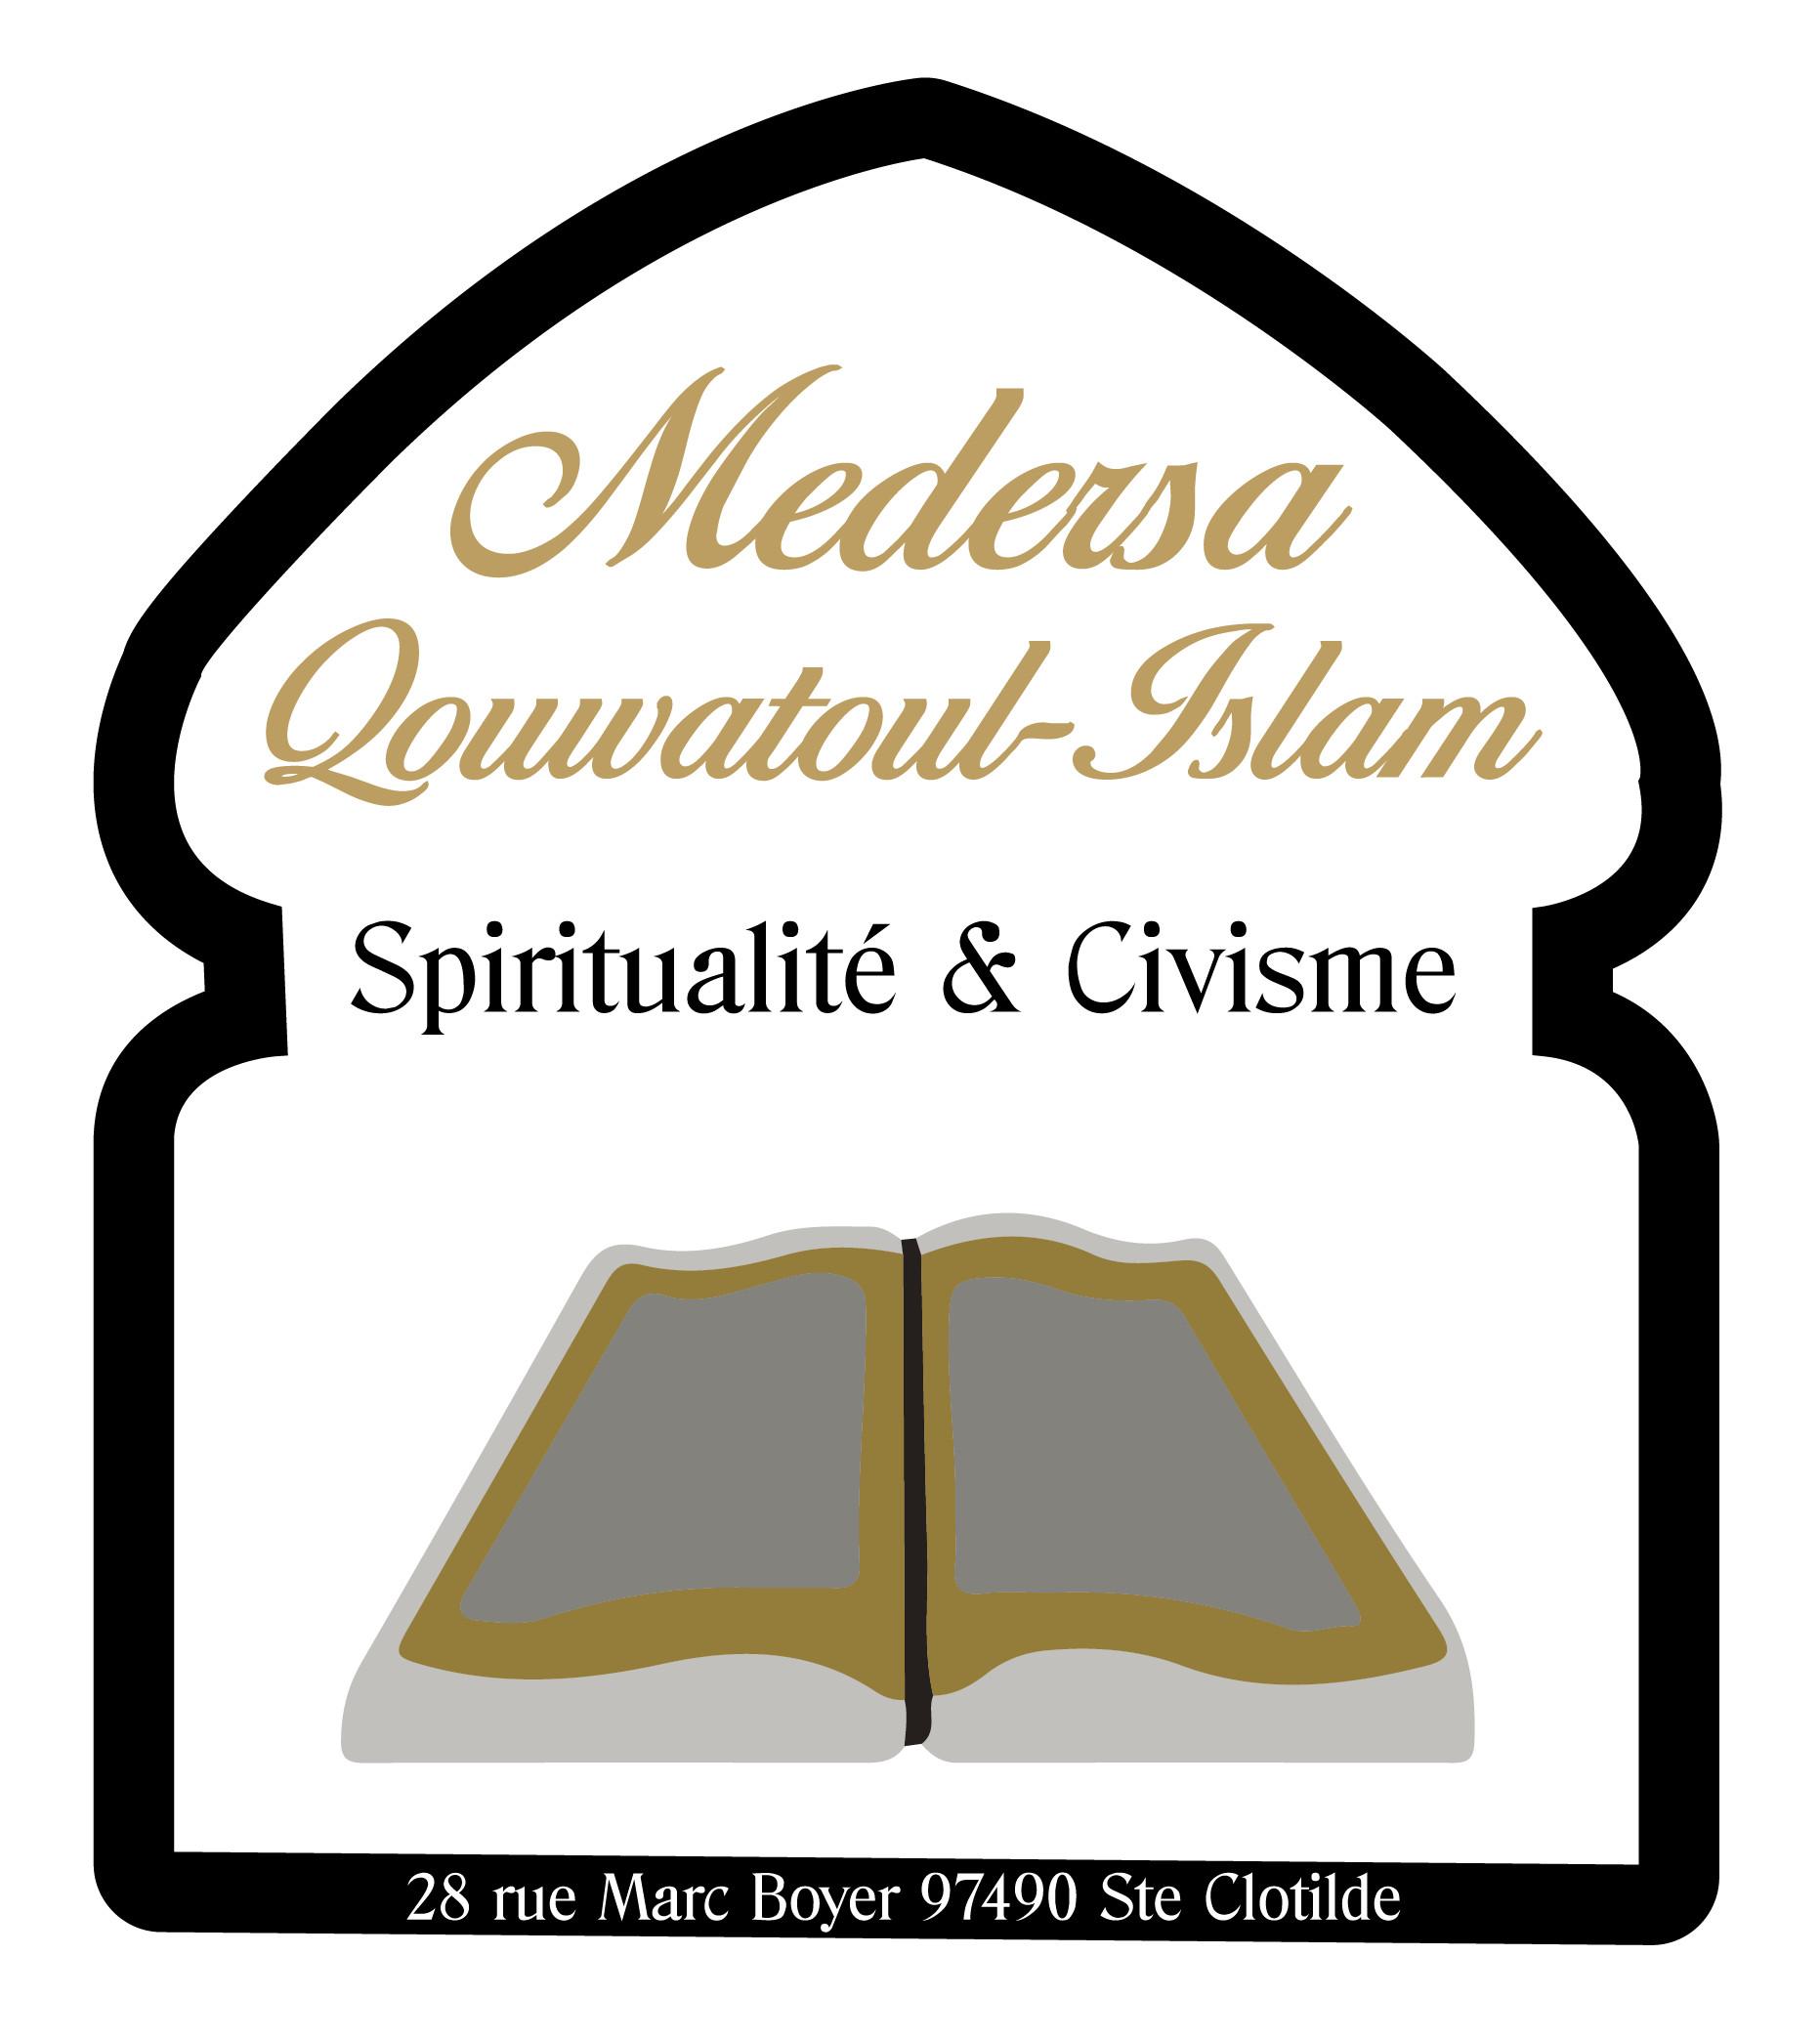 Medersa Qouwatoul Islam